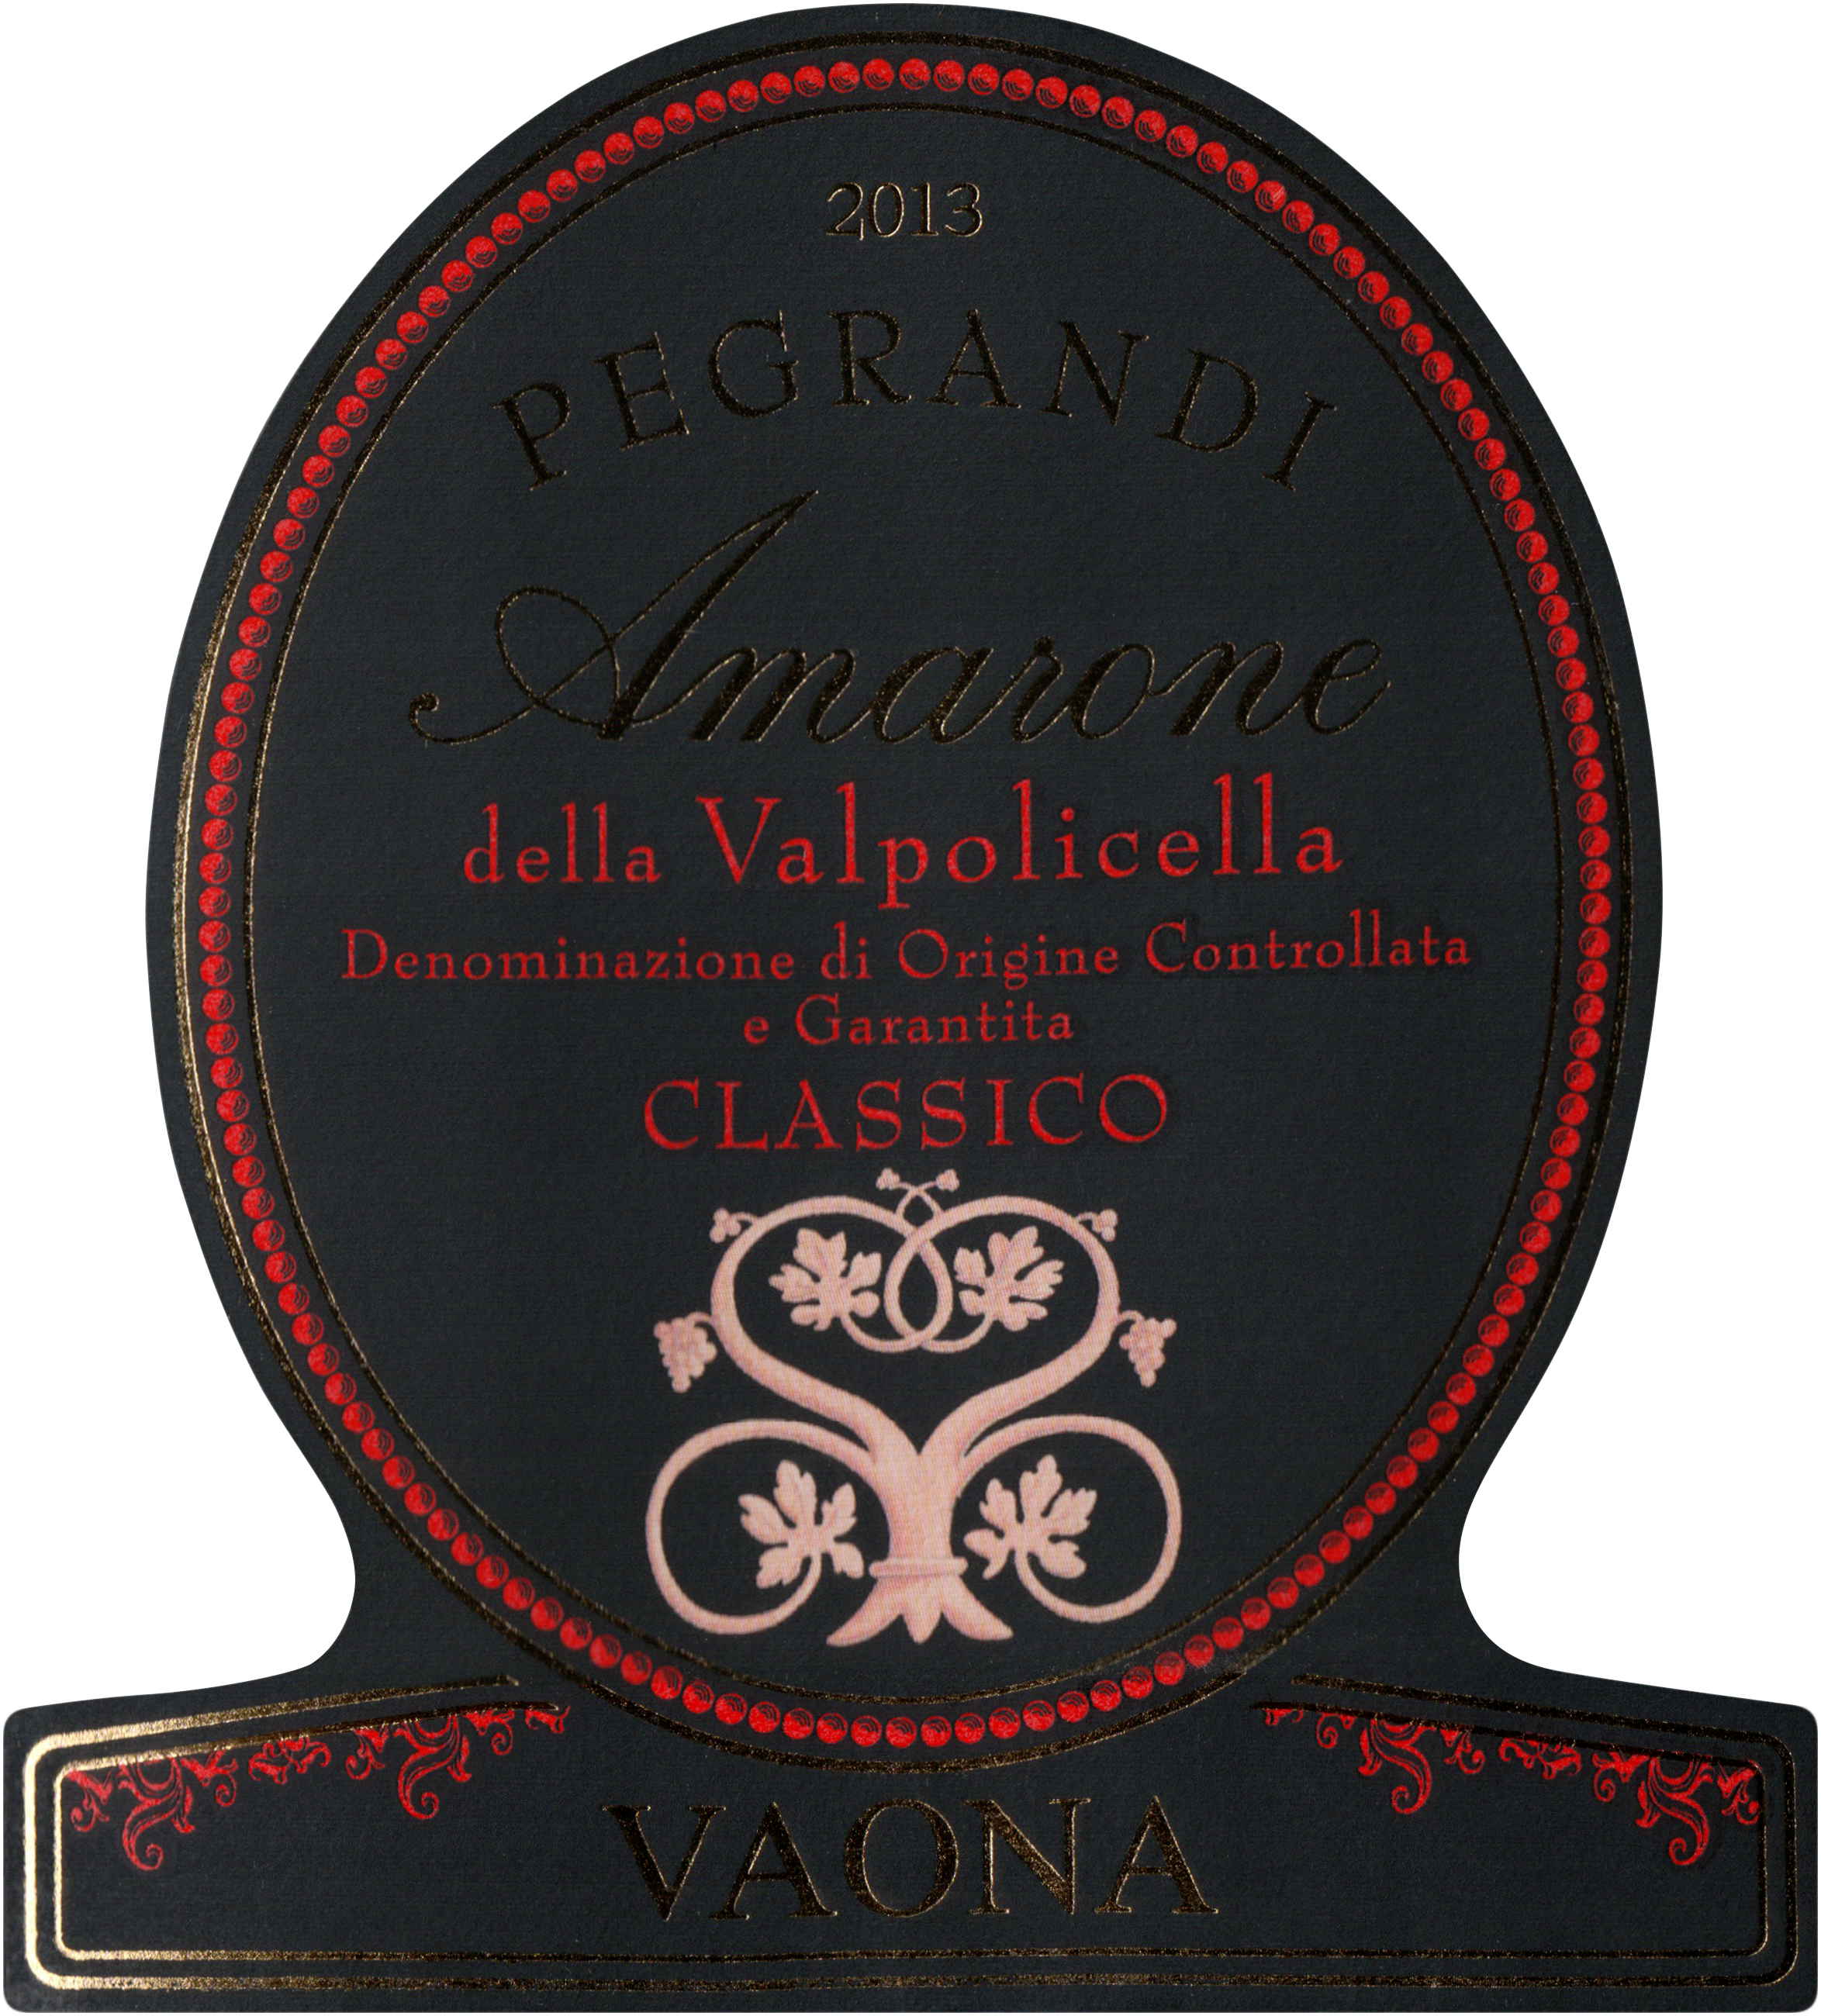 Vaona Pegrandi Amarone Classico 2013